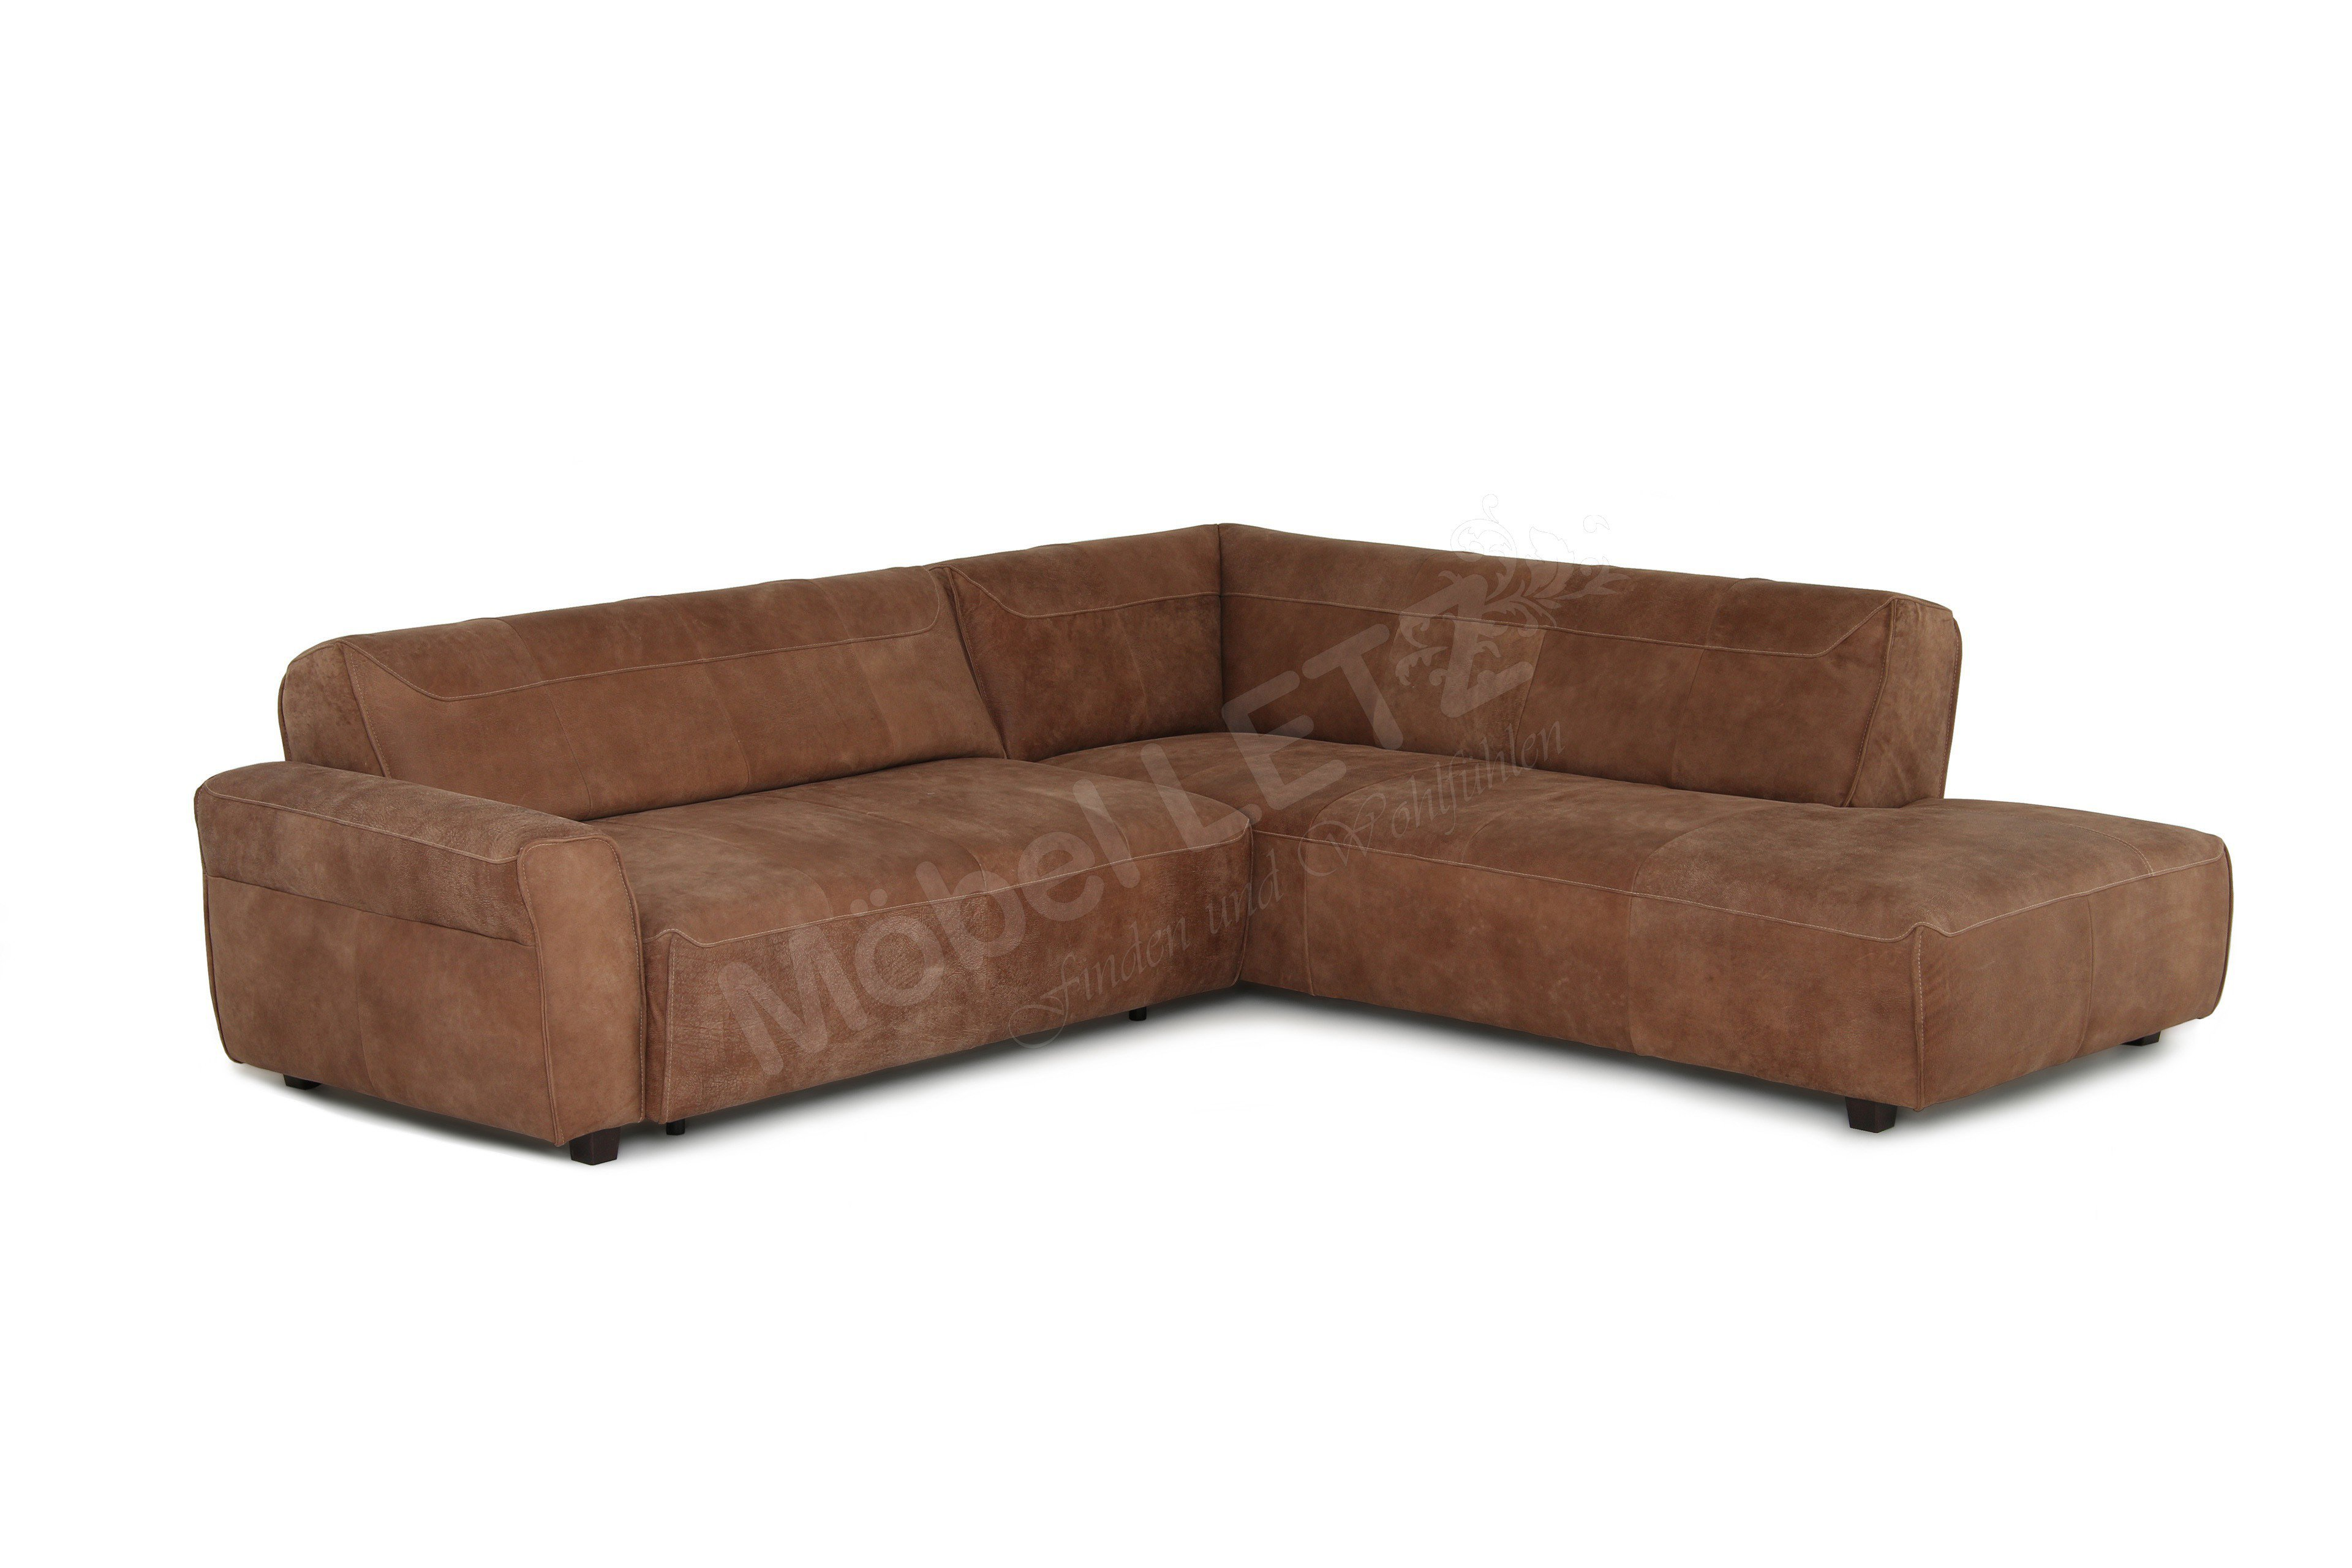 ledersofa loft 552 von ultsch m bel letz ihr onlineshop. Black Bedroom Furniture Sets. Home Design Ideas